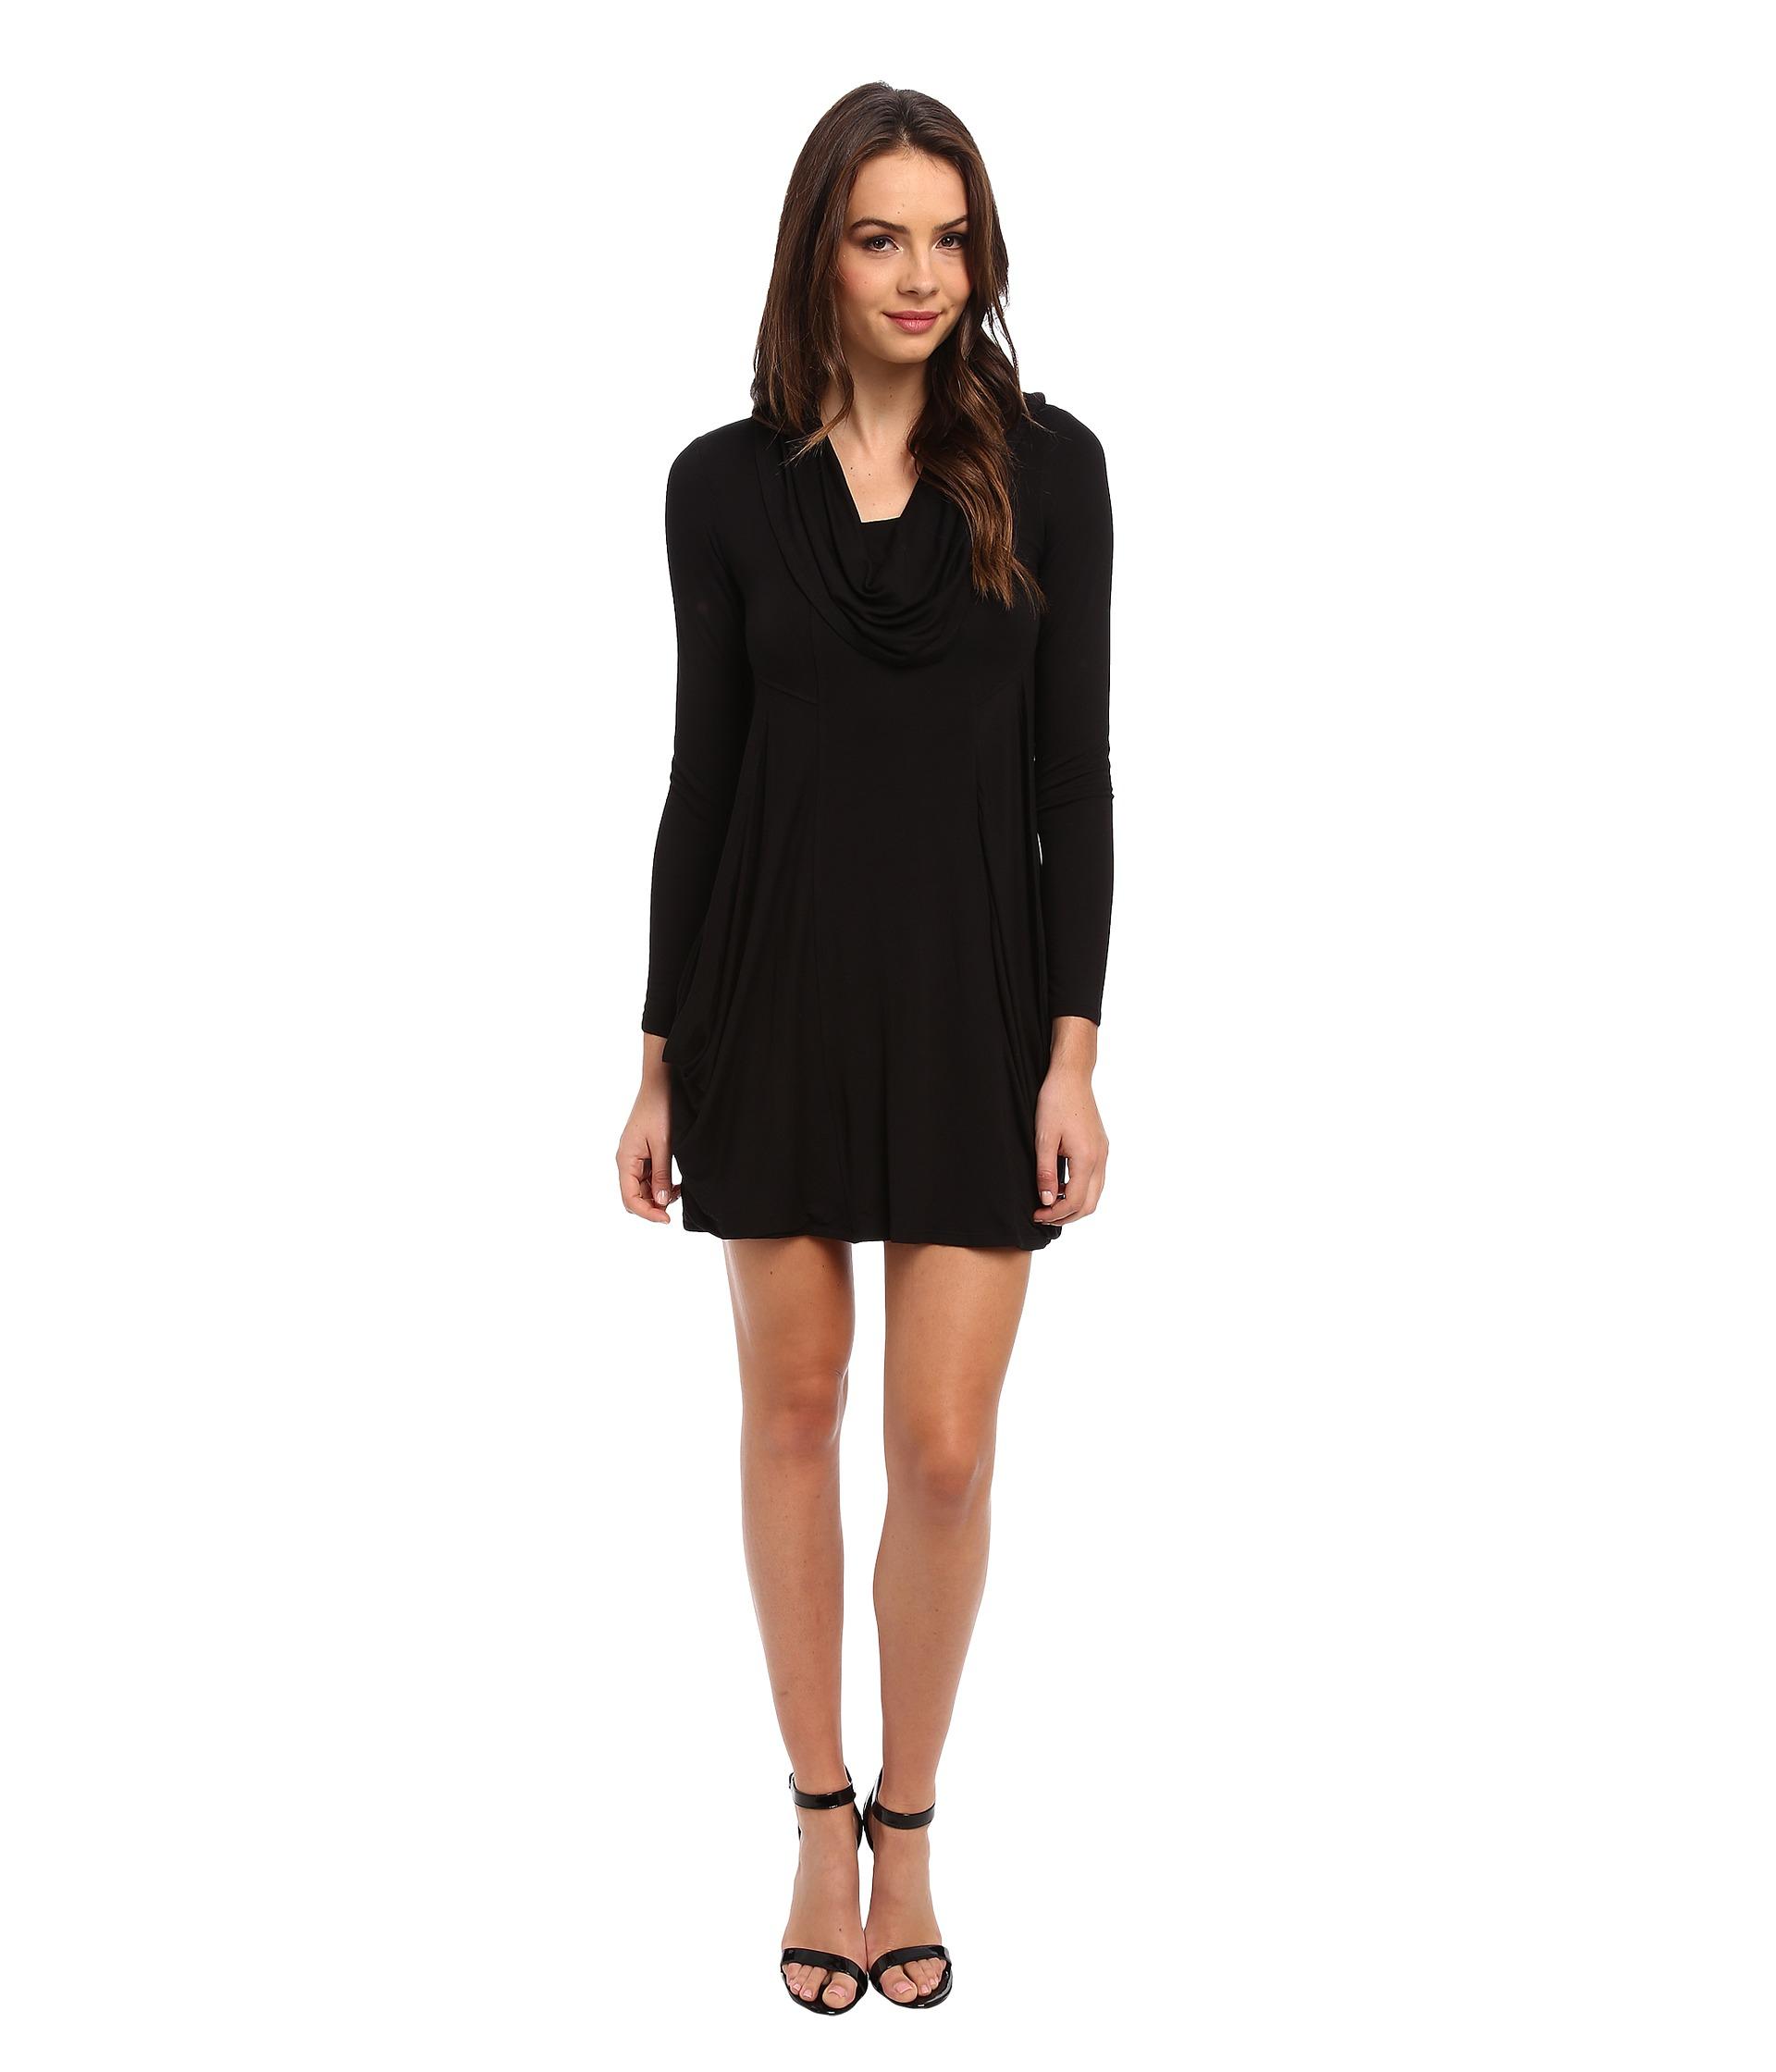 Cowl Dress: Kensie Cowl Neck Pocket Dress In Black